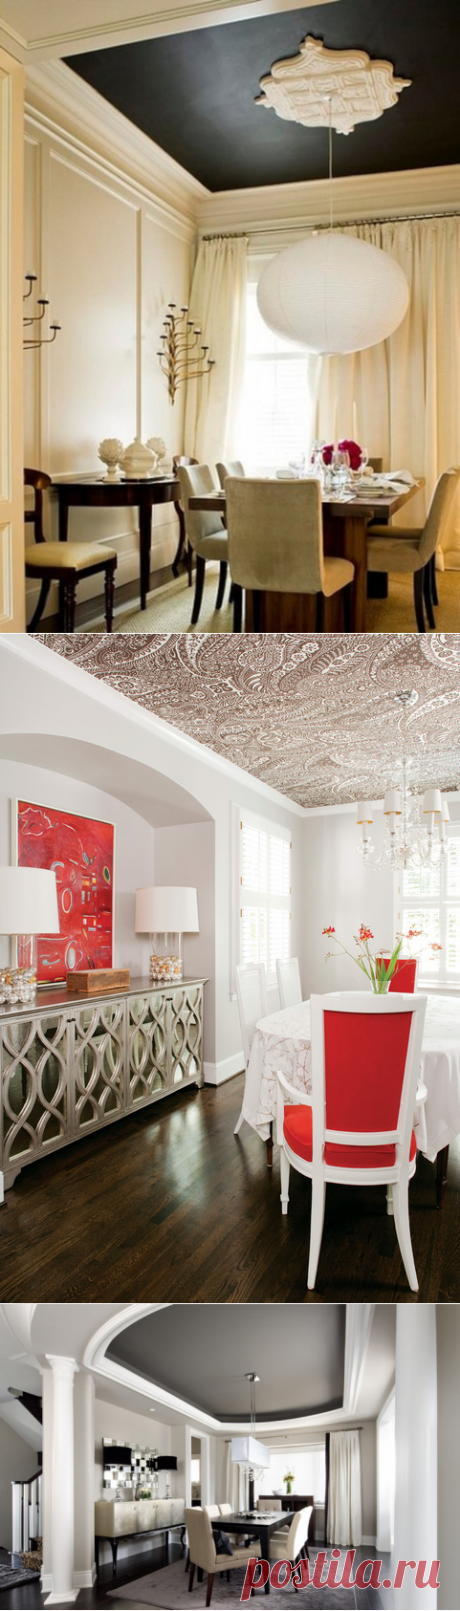 23 original ideas on registration of a ceiling